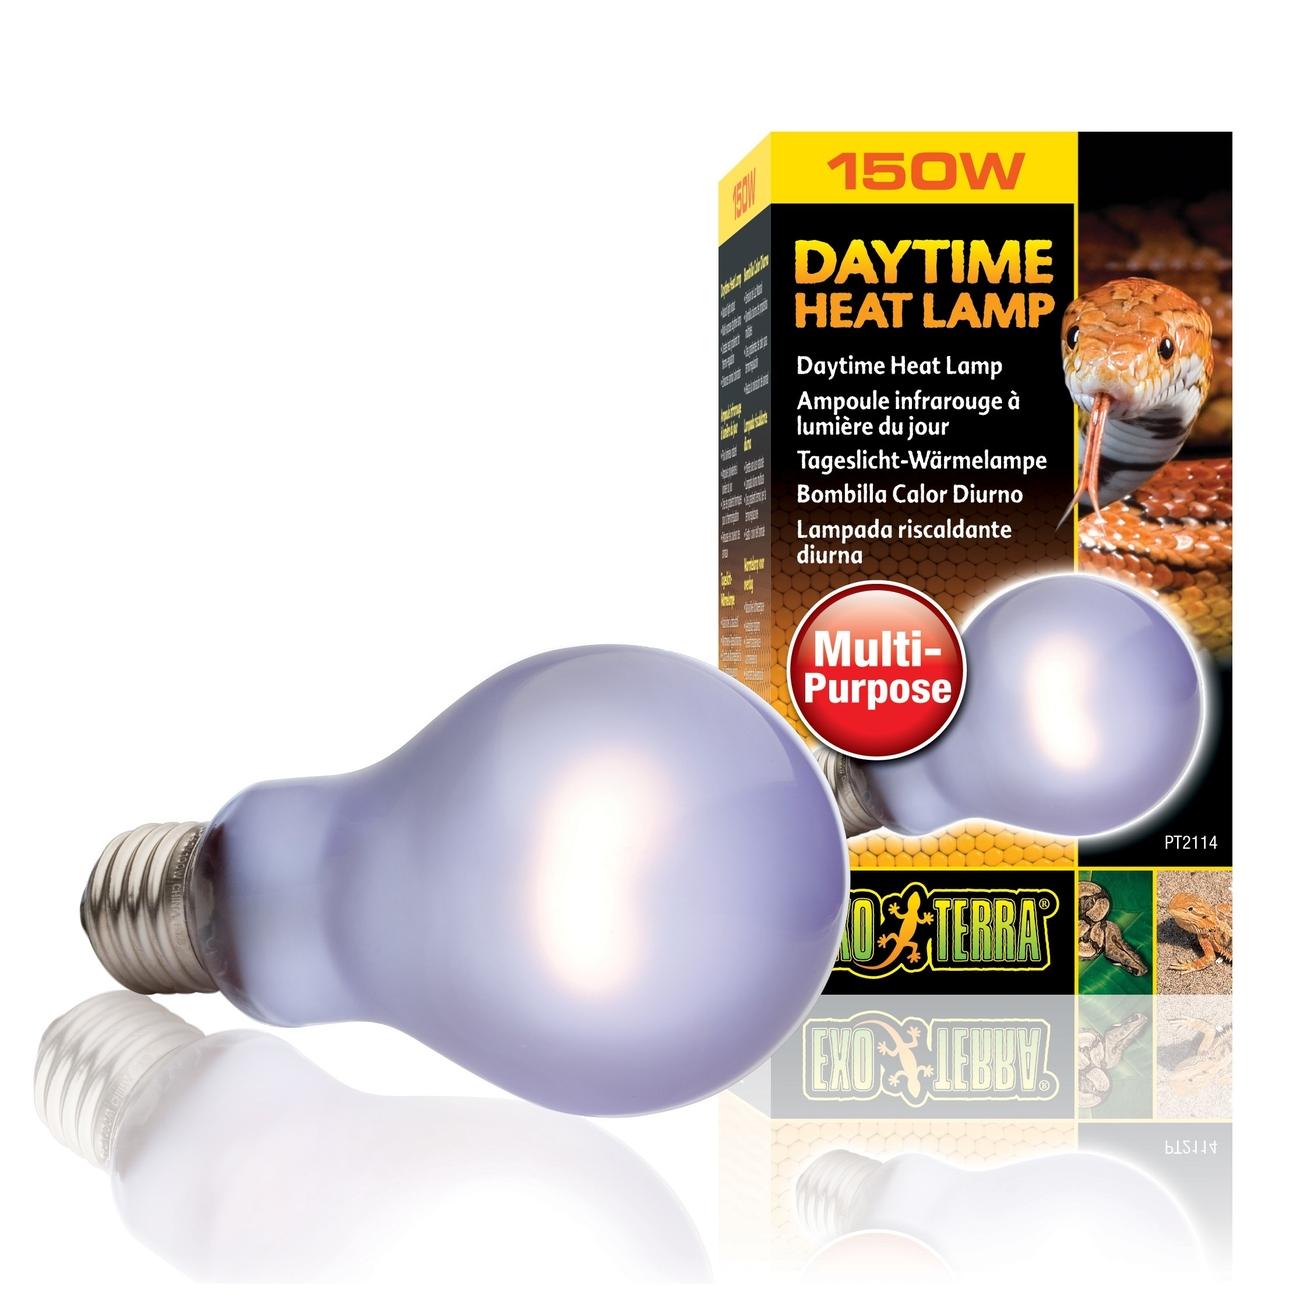 Exo Terra - Daytime Heat Lampe, Bild 13